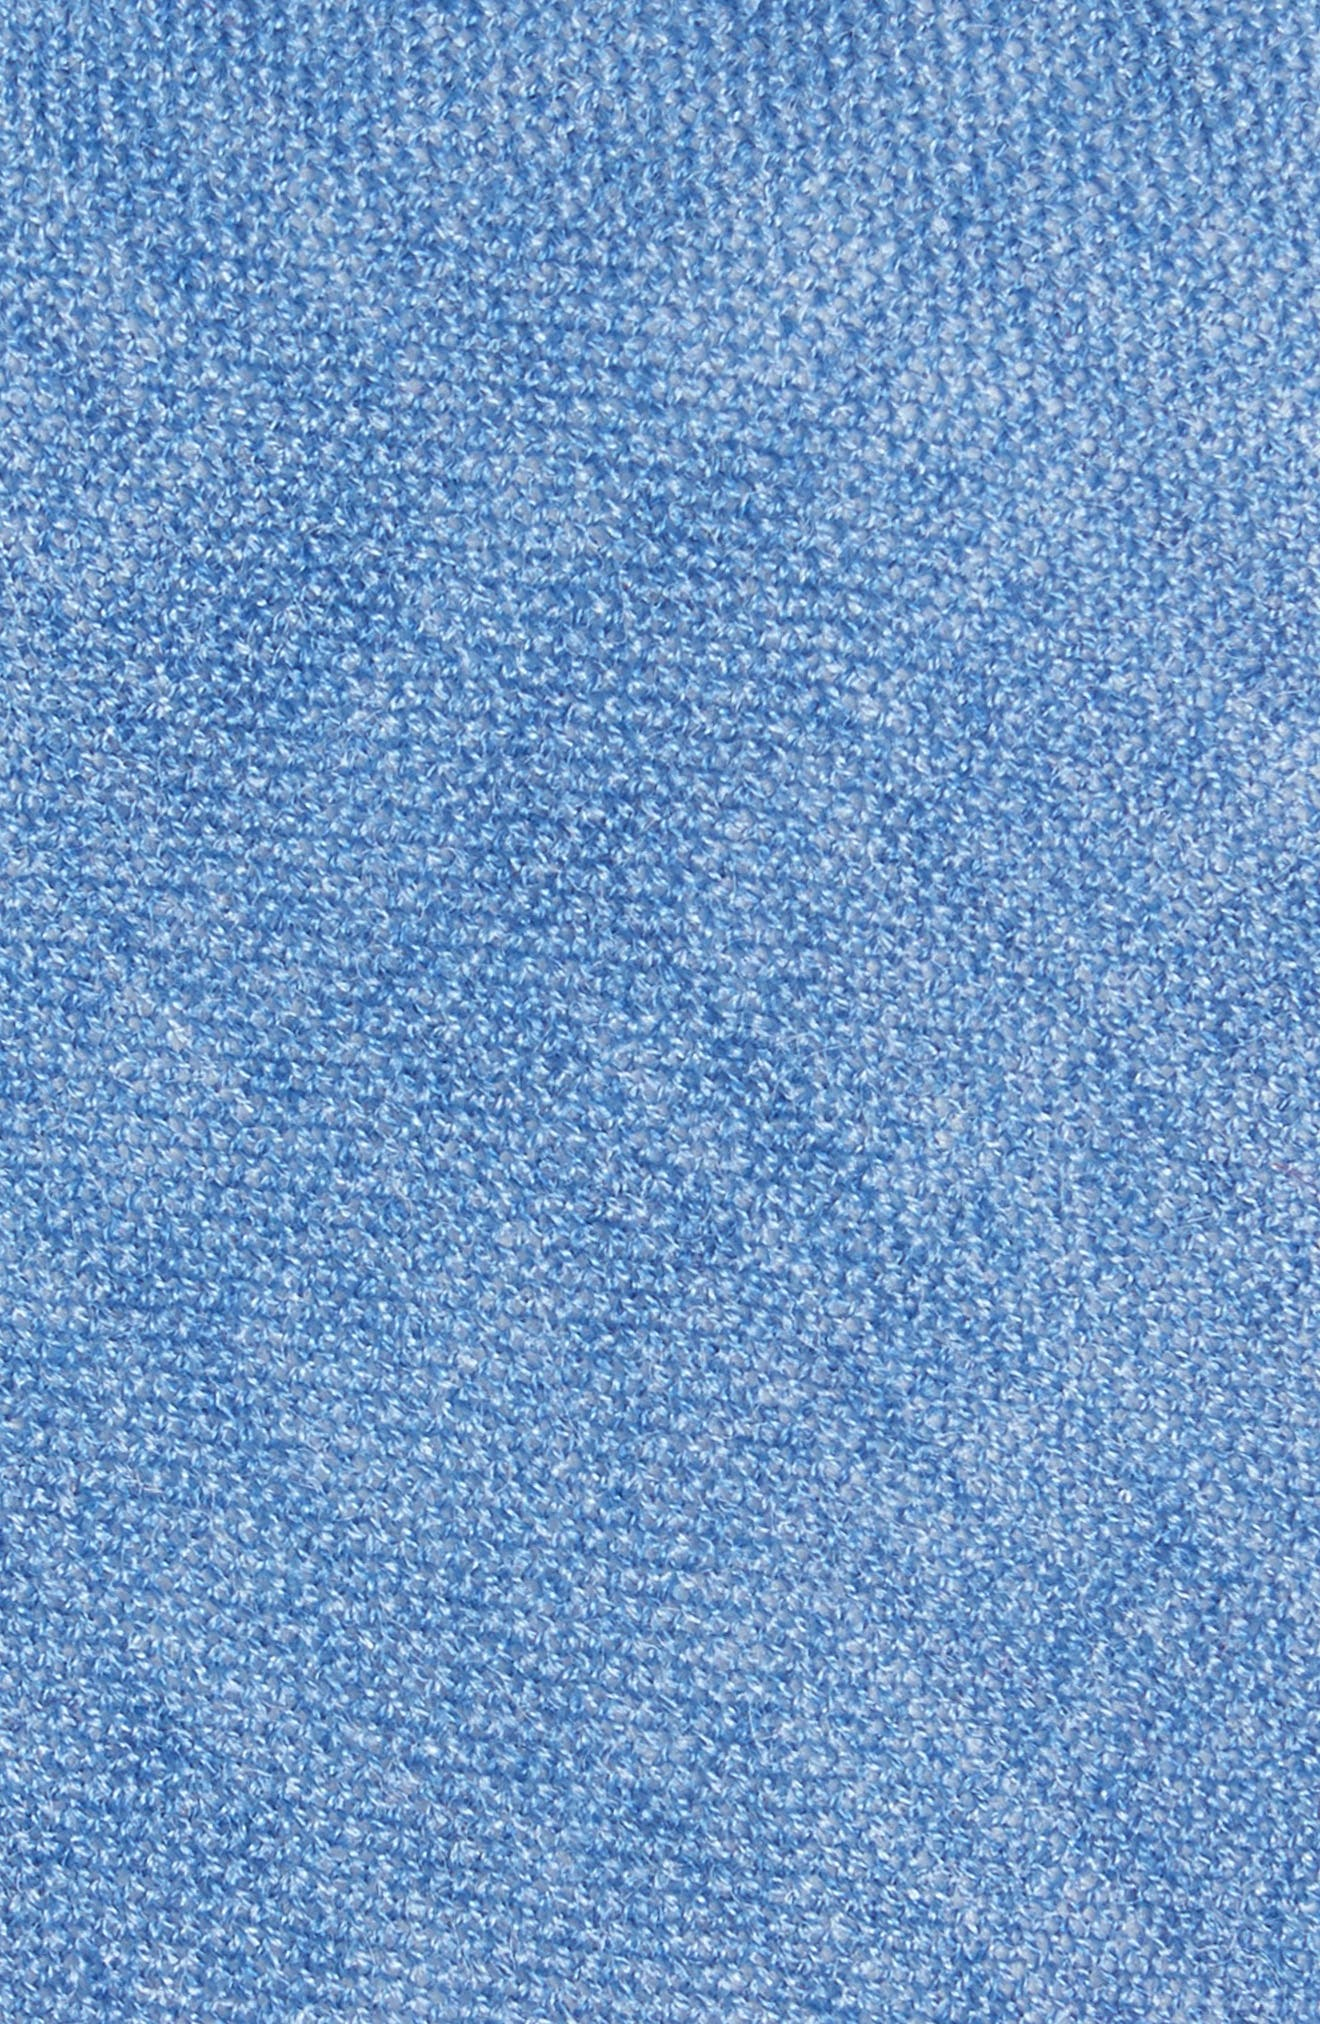 Bradford Solid Cotton Skinny Tie,                             Alternate thumbnail 2, color,                             400